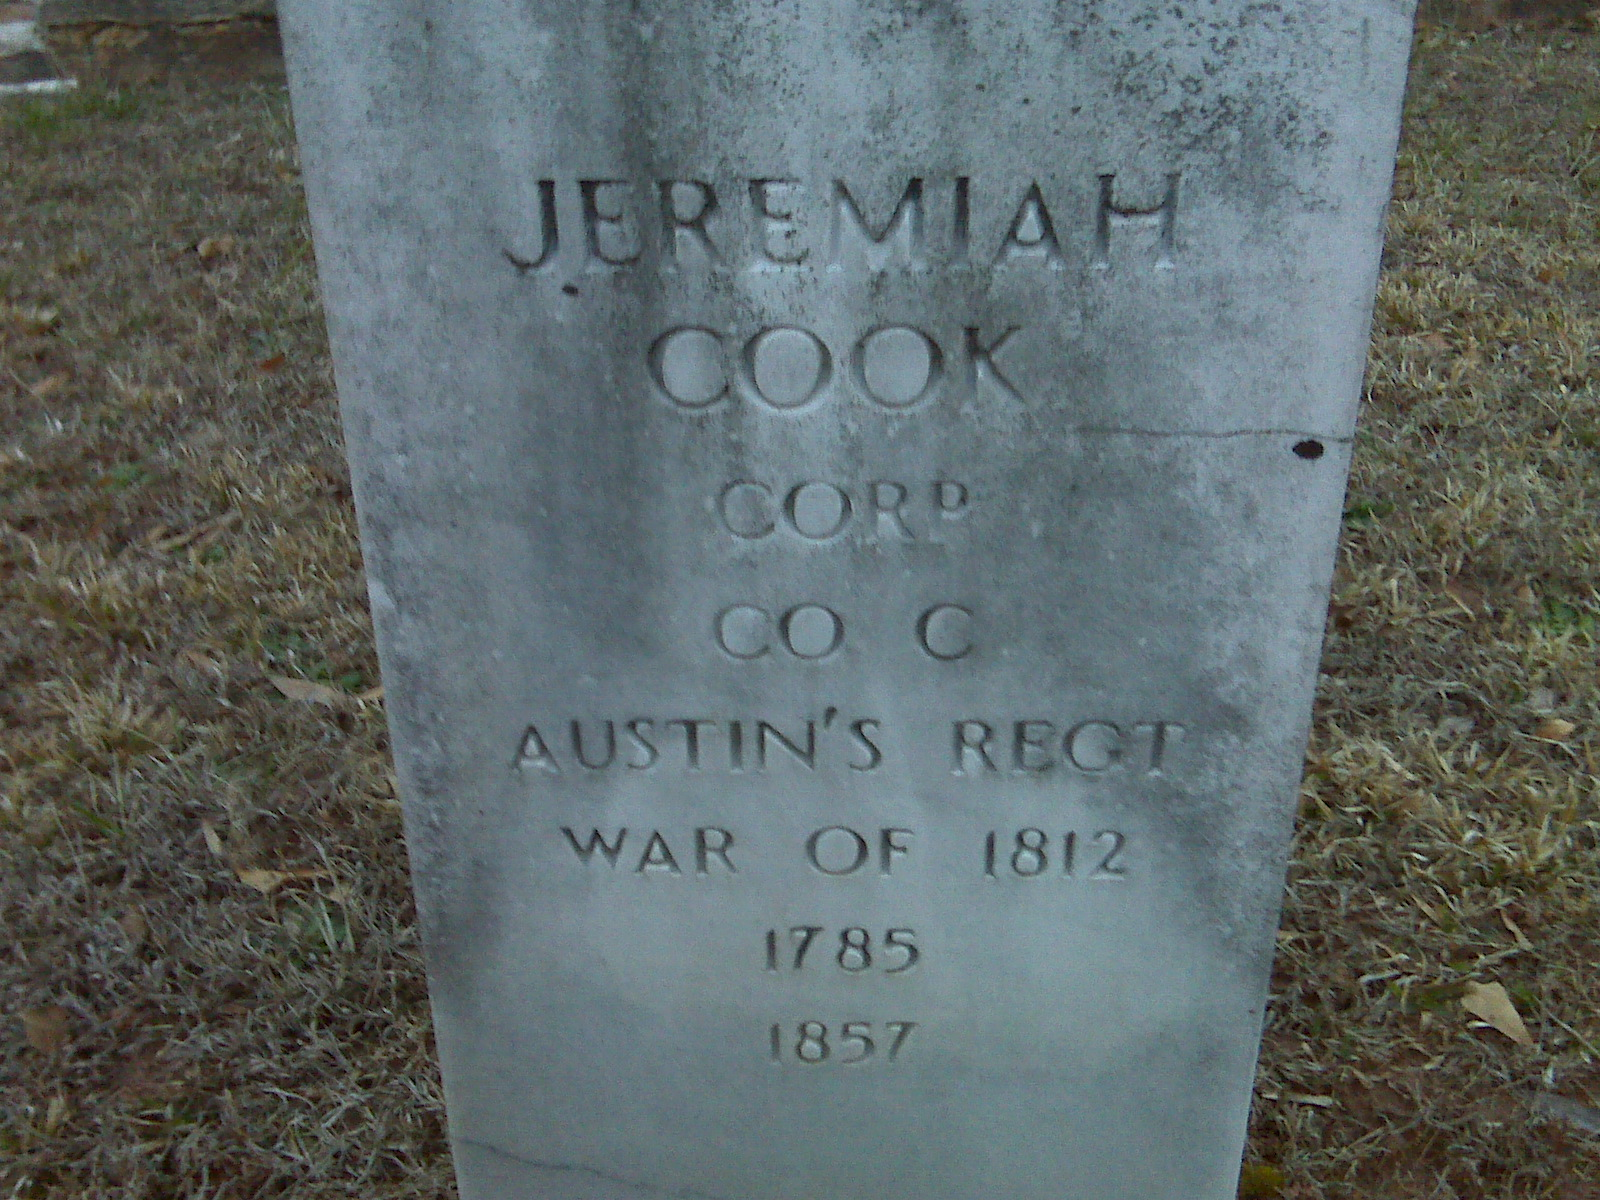 Jeremiah Cook